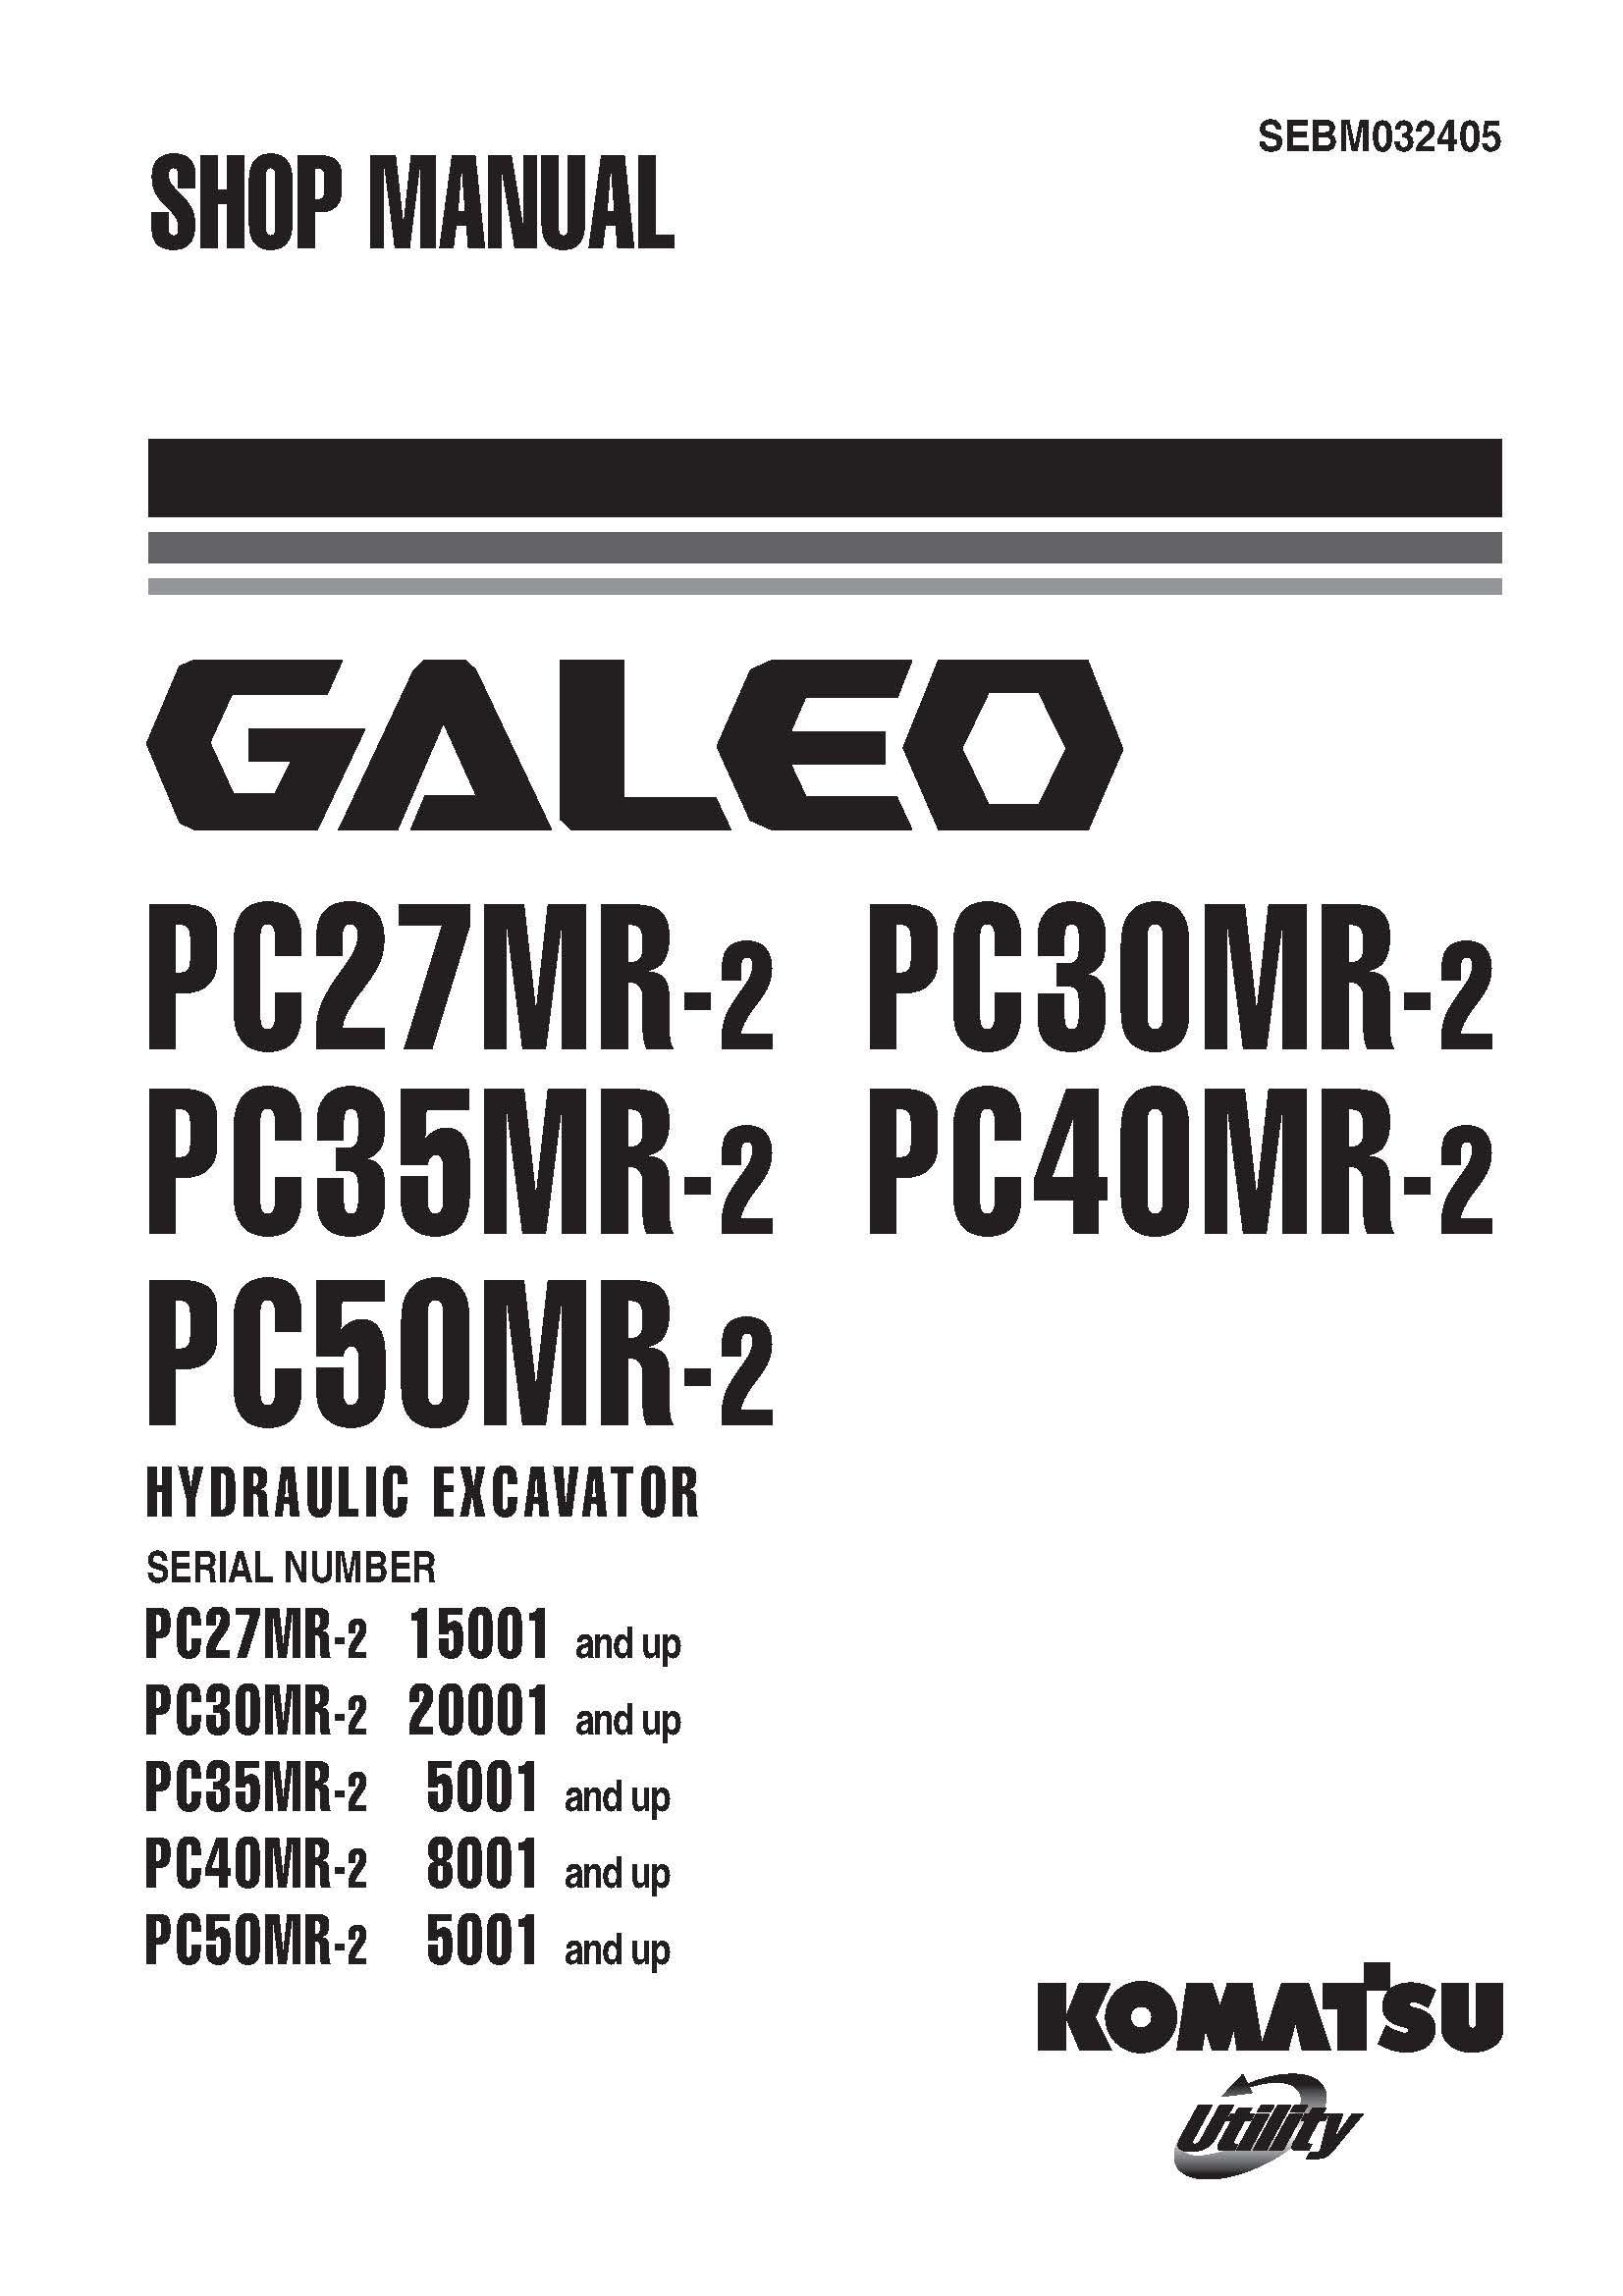 Komatsu PC27MR-2/ PC30MR-2/ PC35MR-2/ PC40MR-2/ PC50MR-2